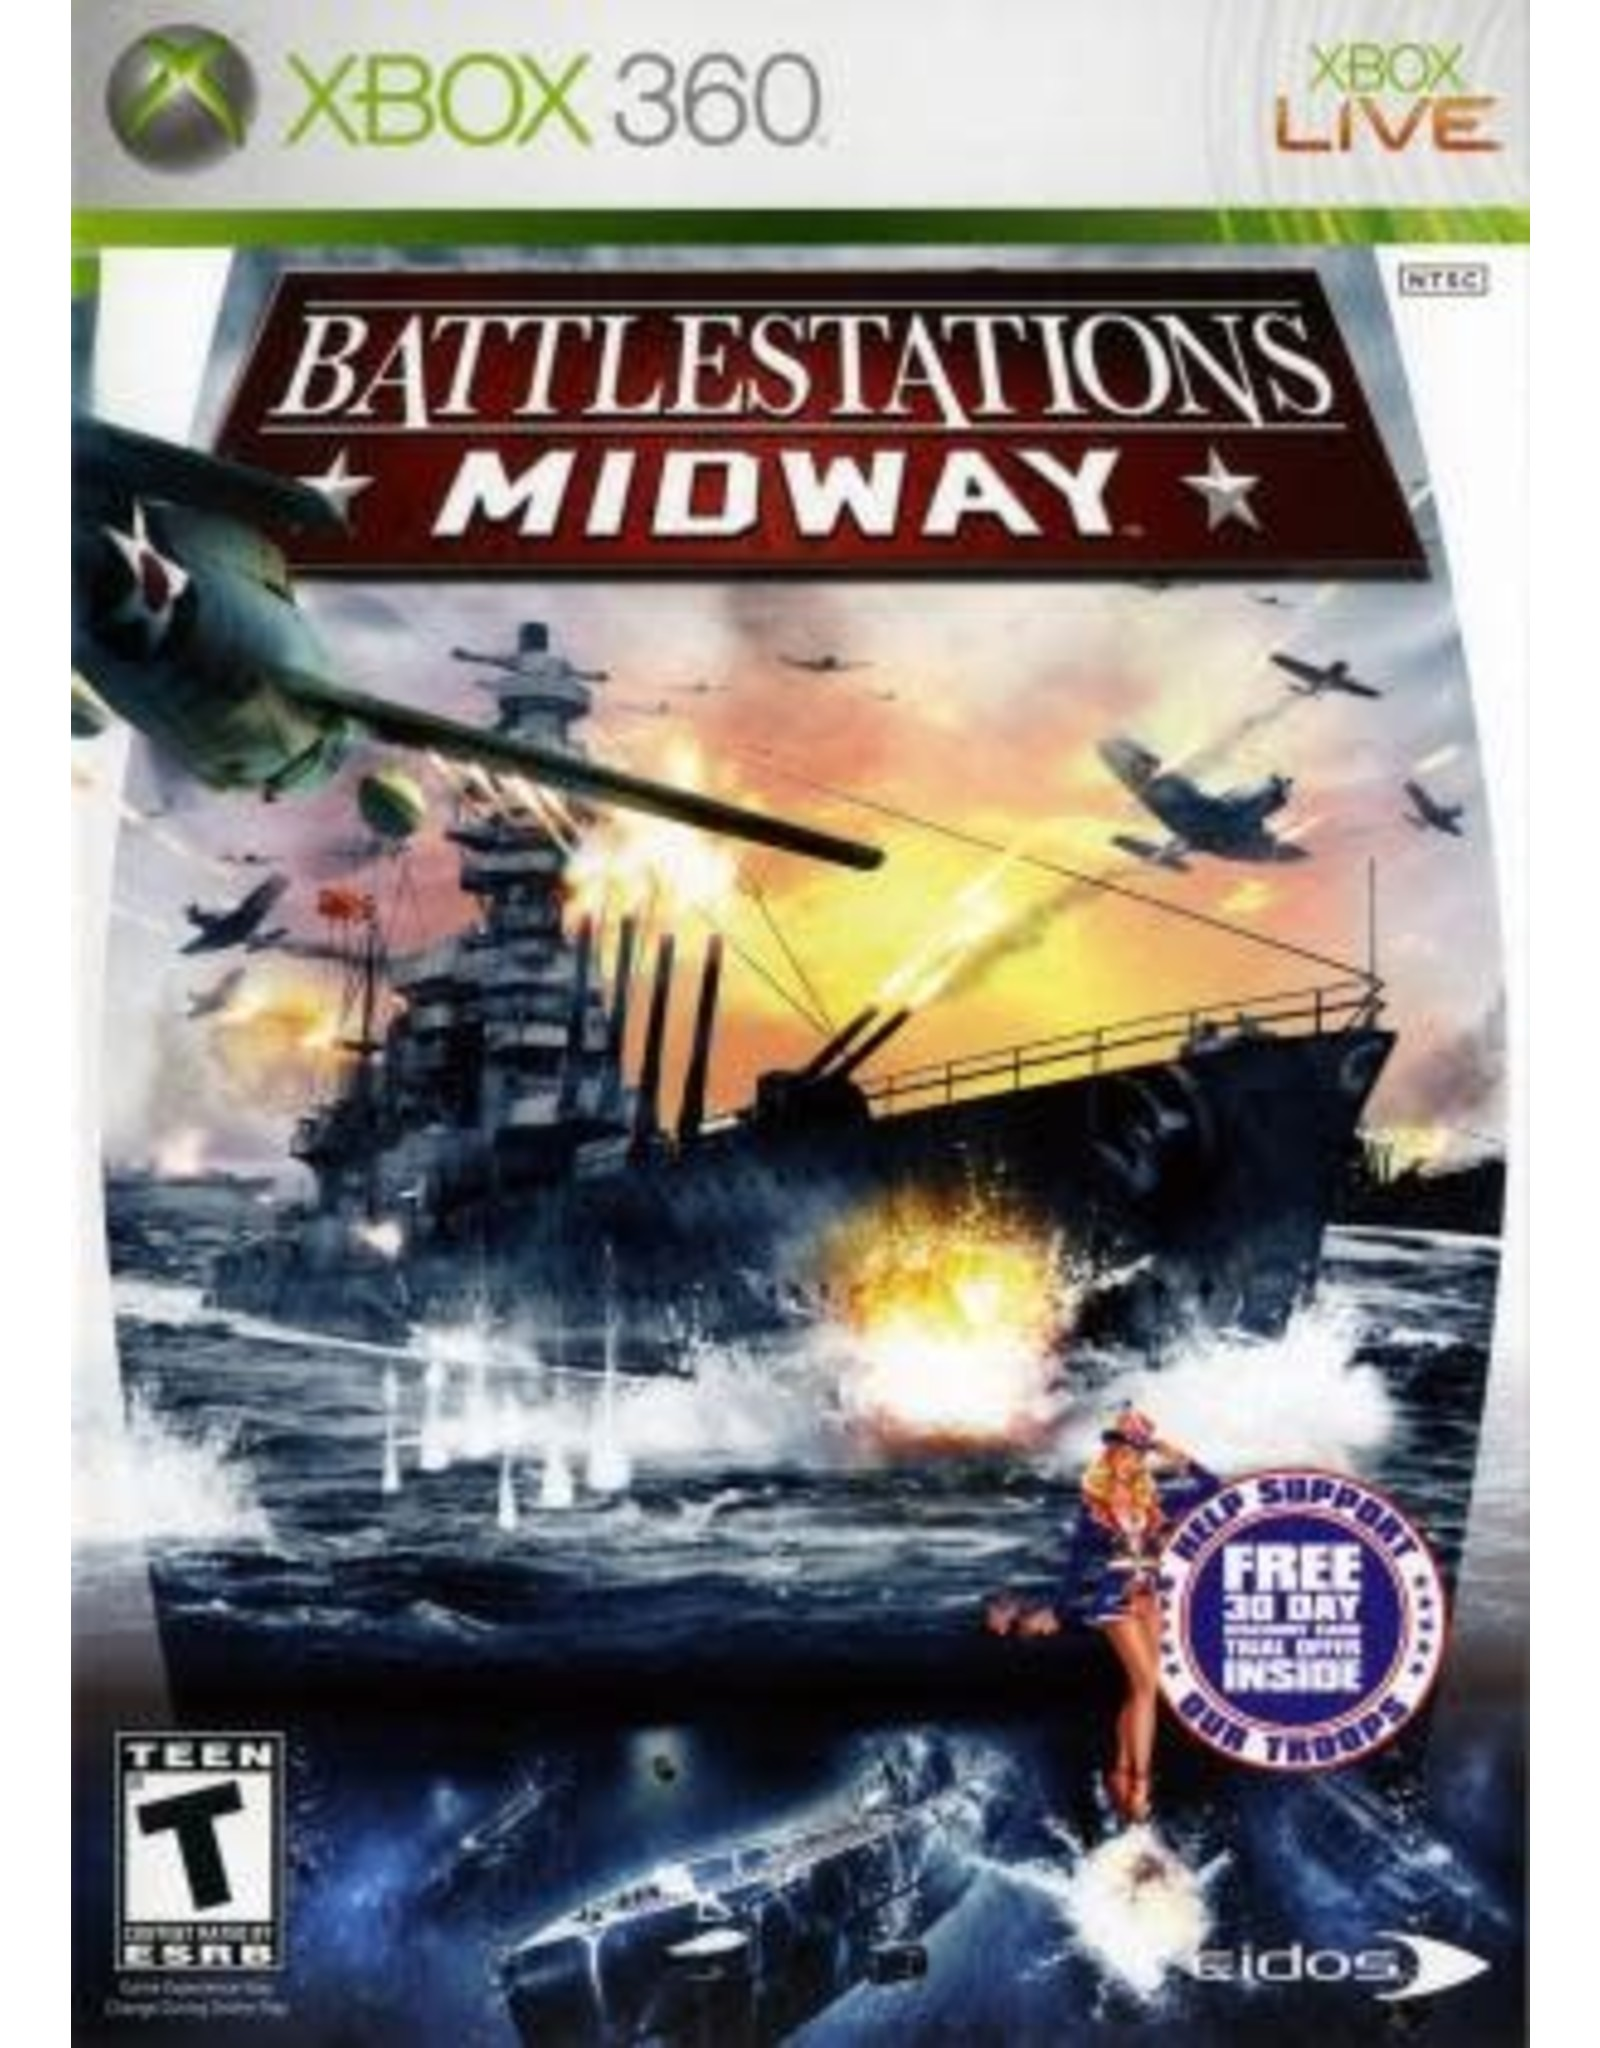 Xbox 360 Battlestations Midway (CiB)